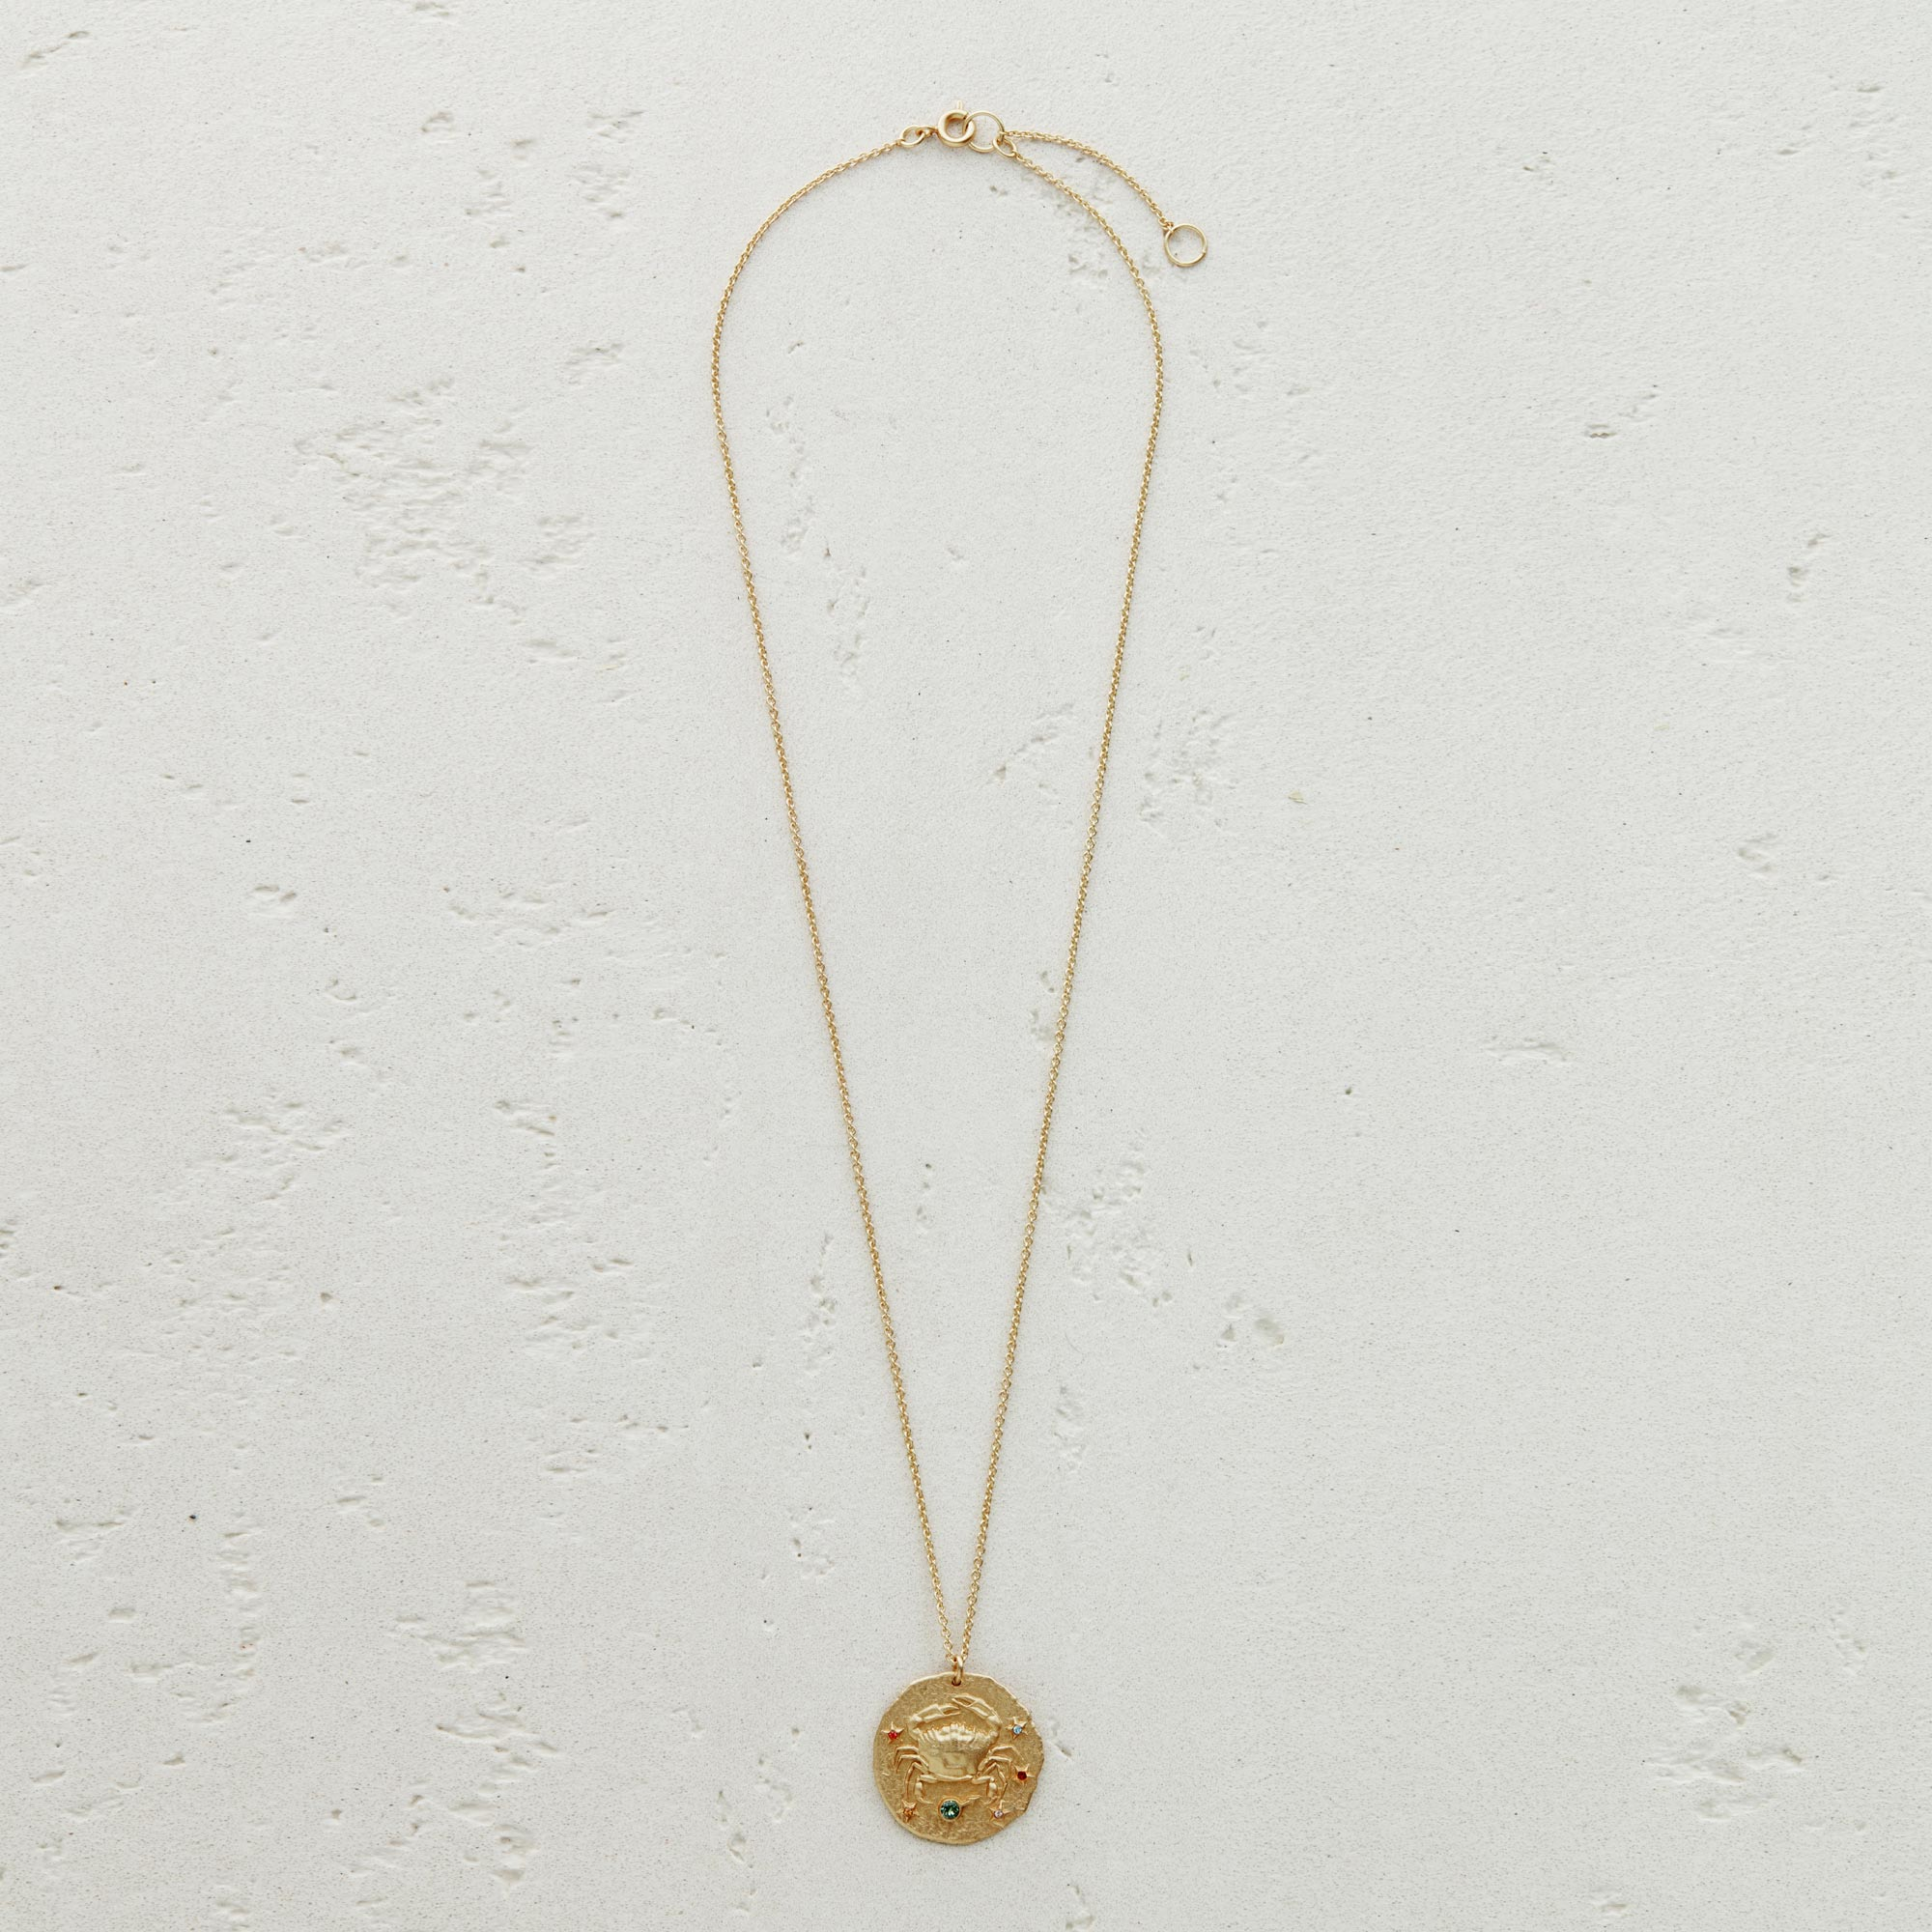 Maje Cancer Necklace